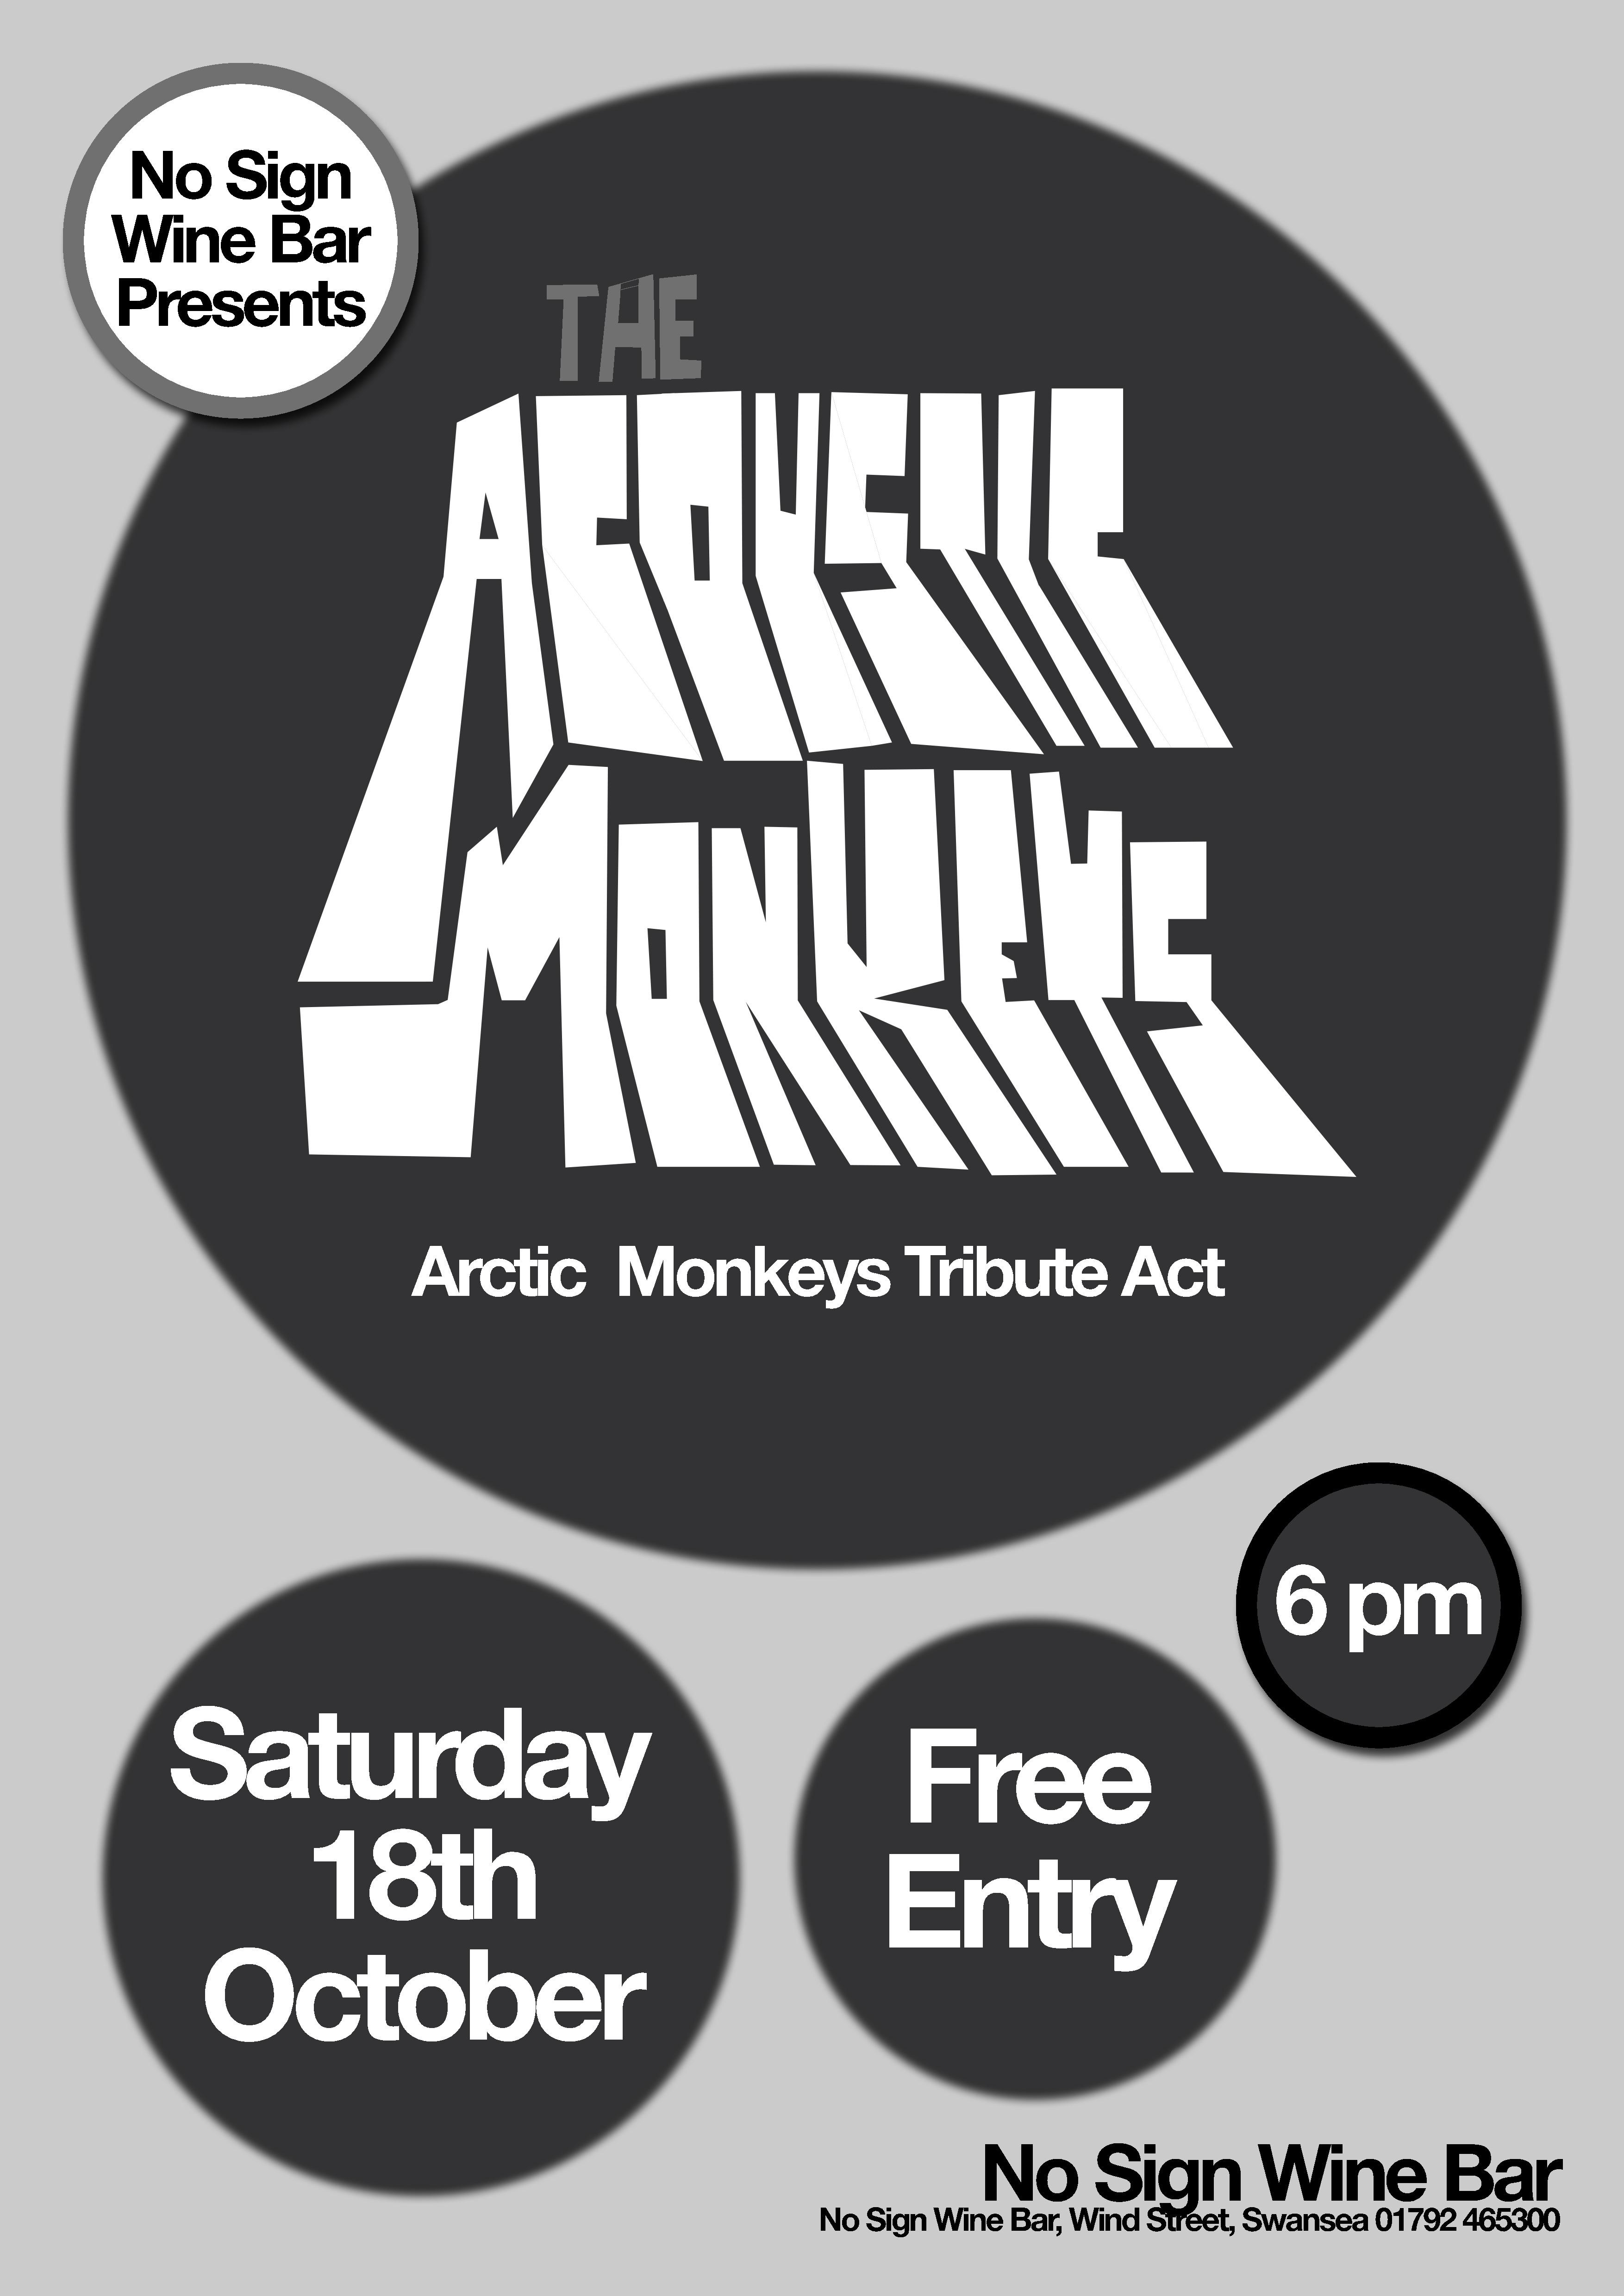 Acoustic Monkeys | 18.10.14 | Free entry | The Vault Swansea